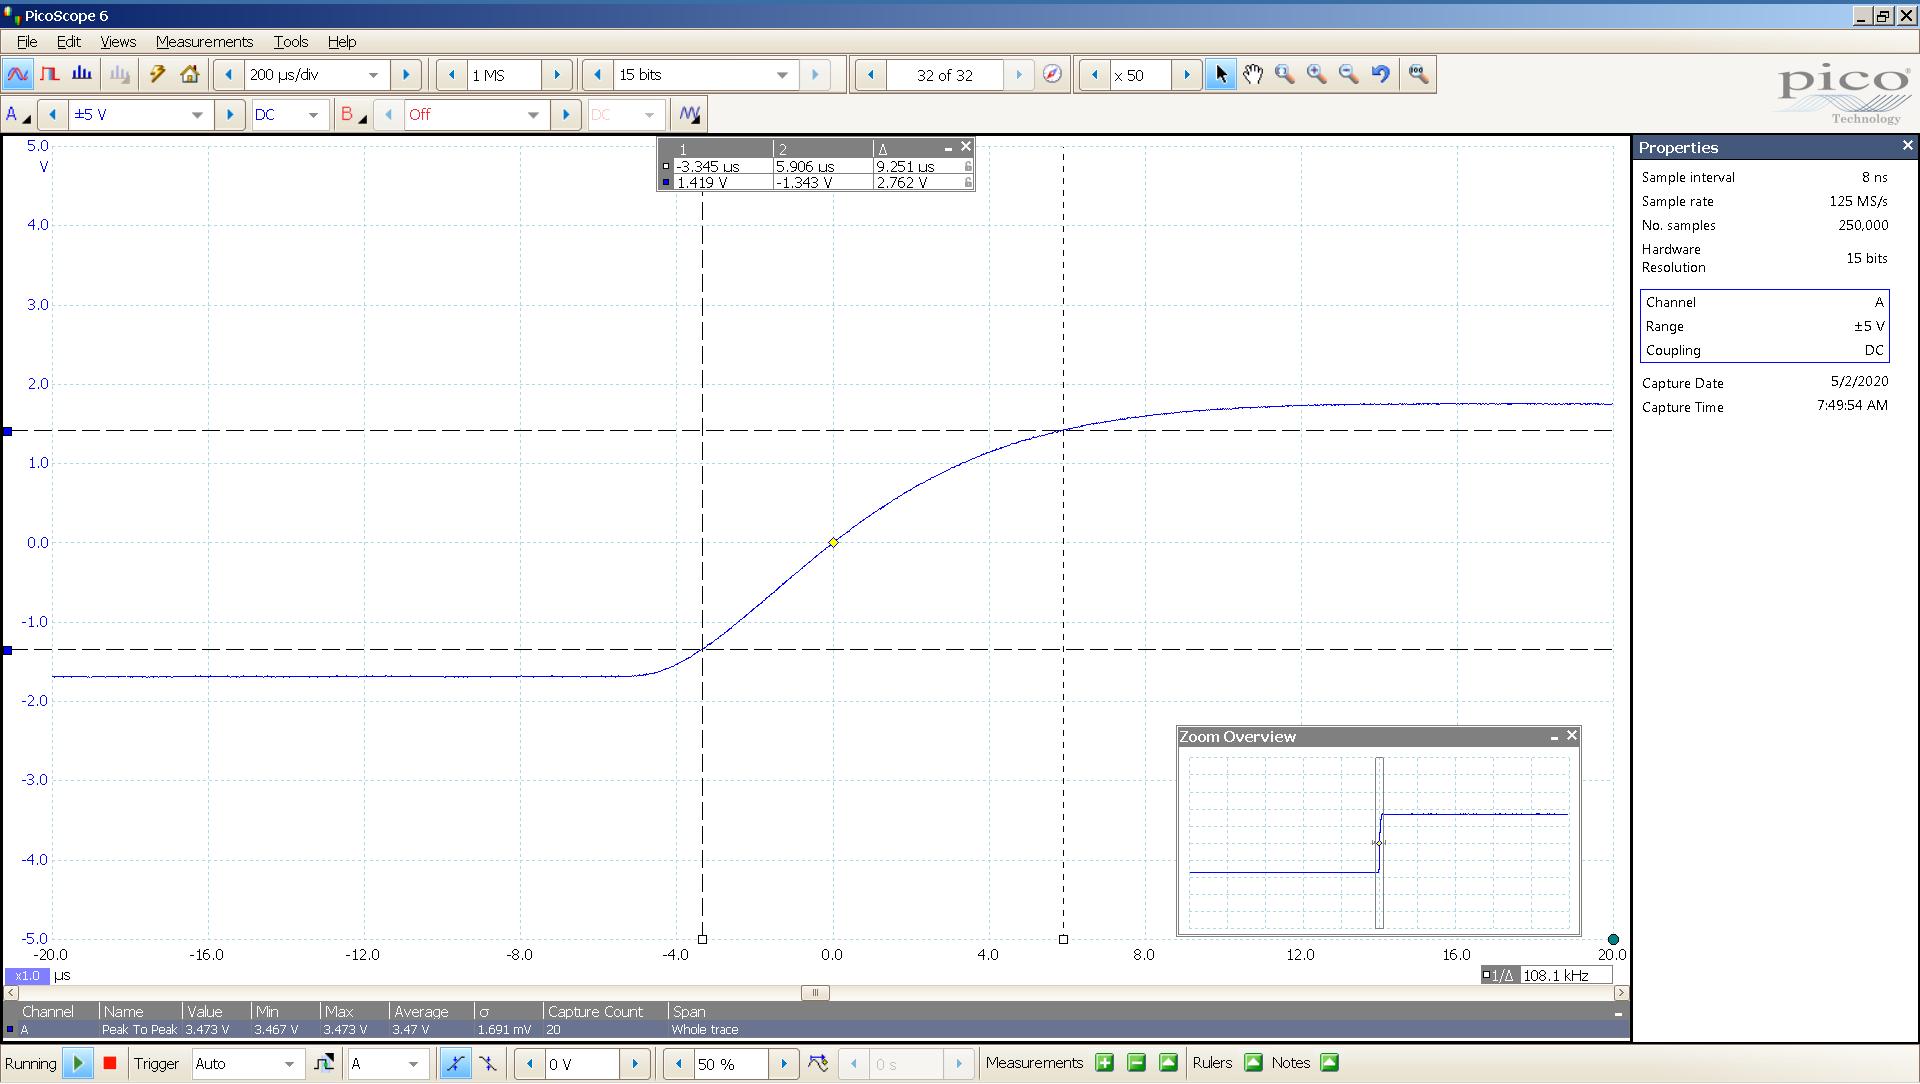 20200502-09 KTE Spring2 20 Hz sqr -4 dBFS 4 Vpp 200uS div SE - ASIO - NOS - BW calc.png